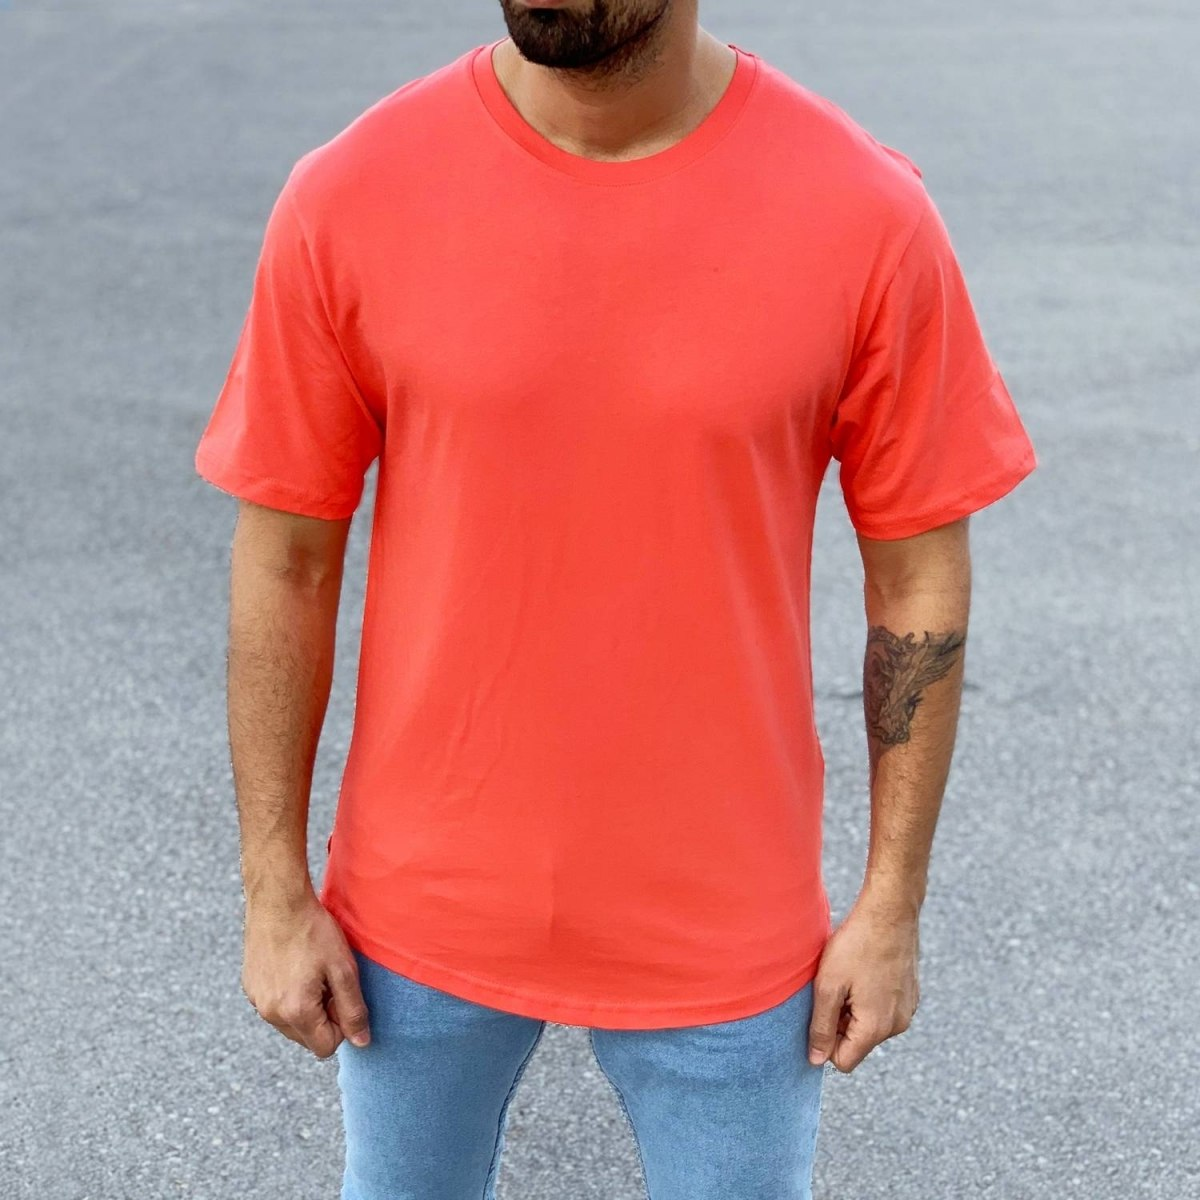 Men's Basic Round Neck T-Shirt In New Red Mv Premium Brand - 1